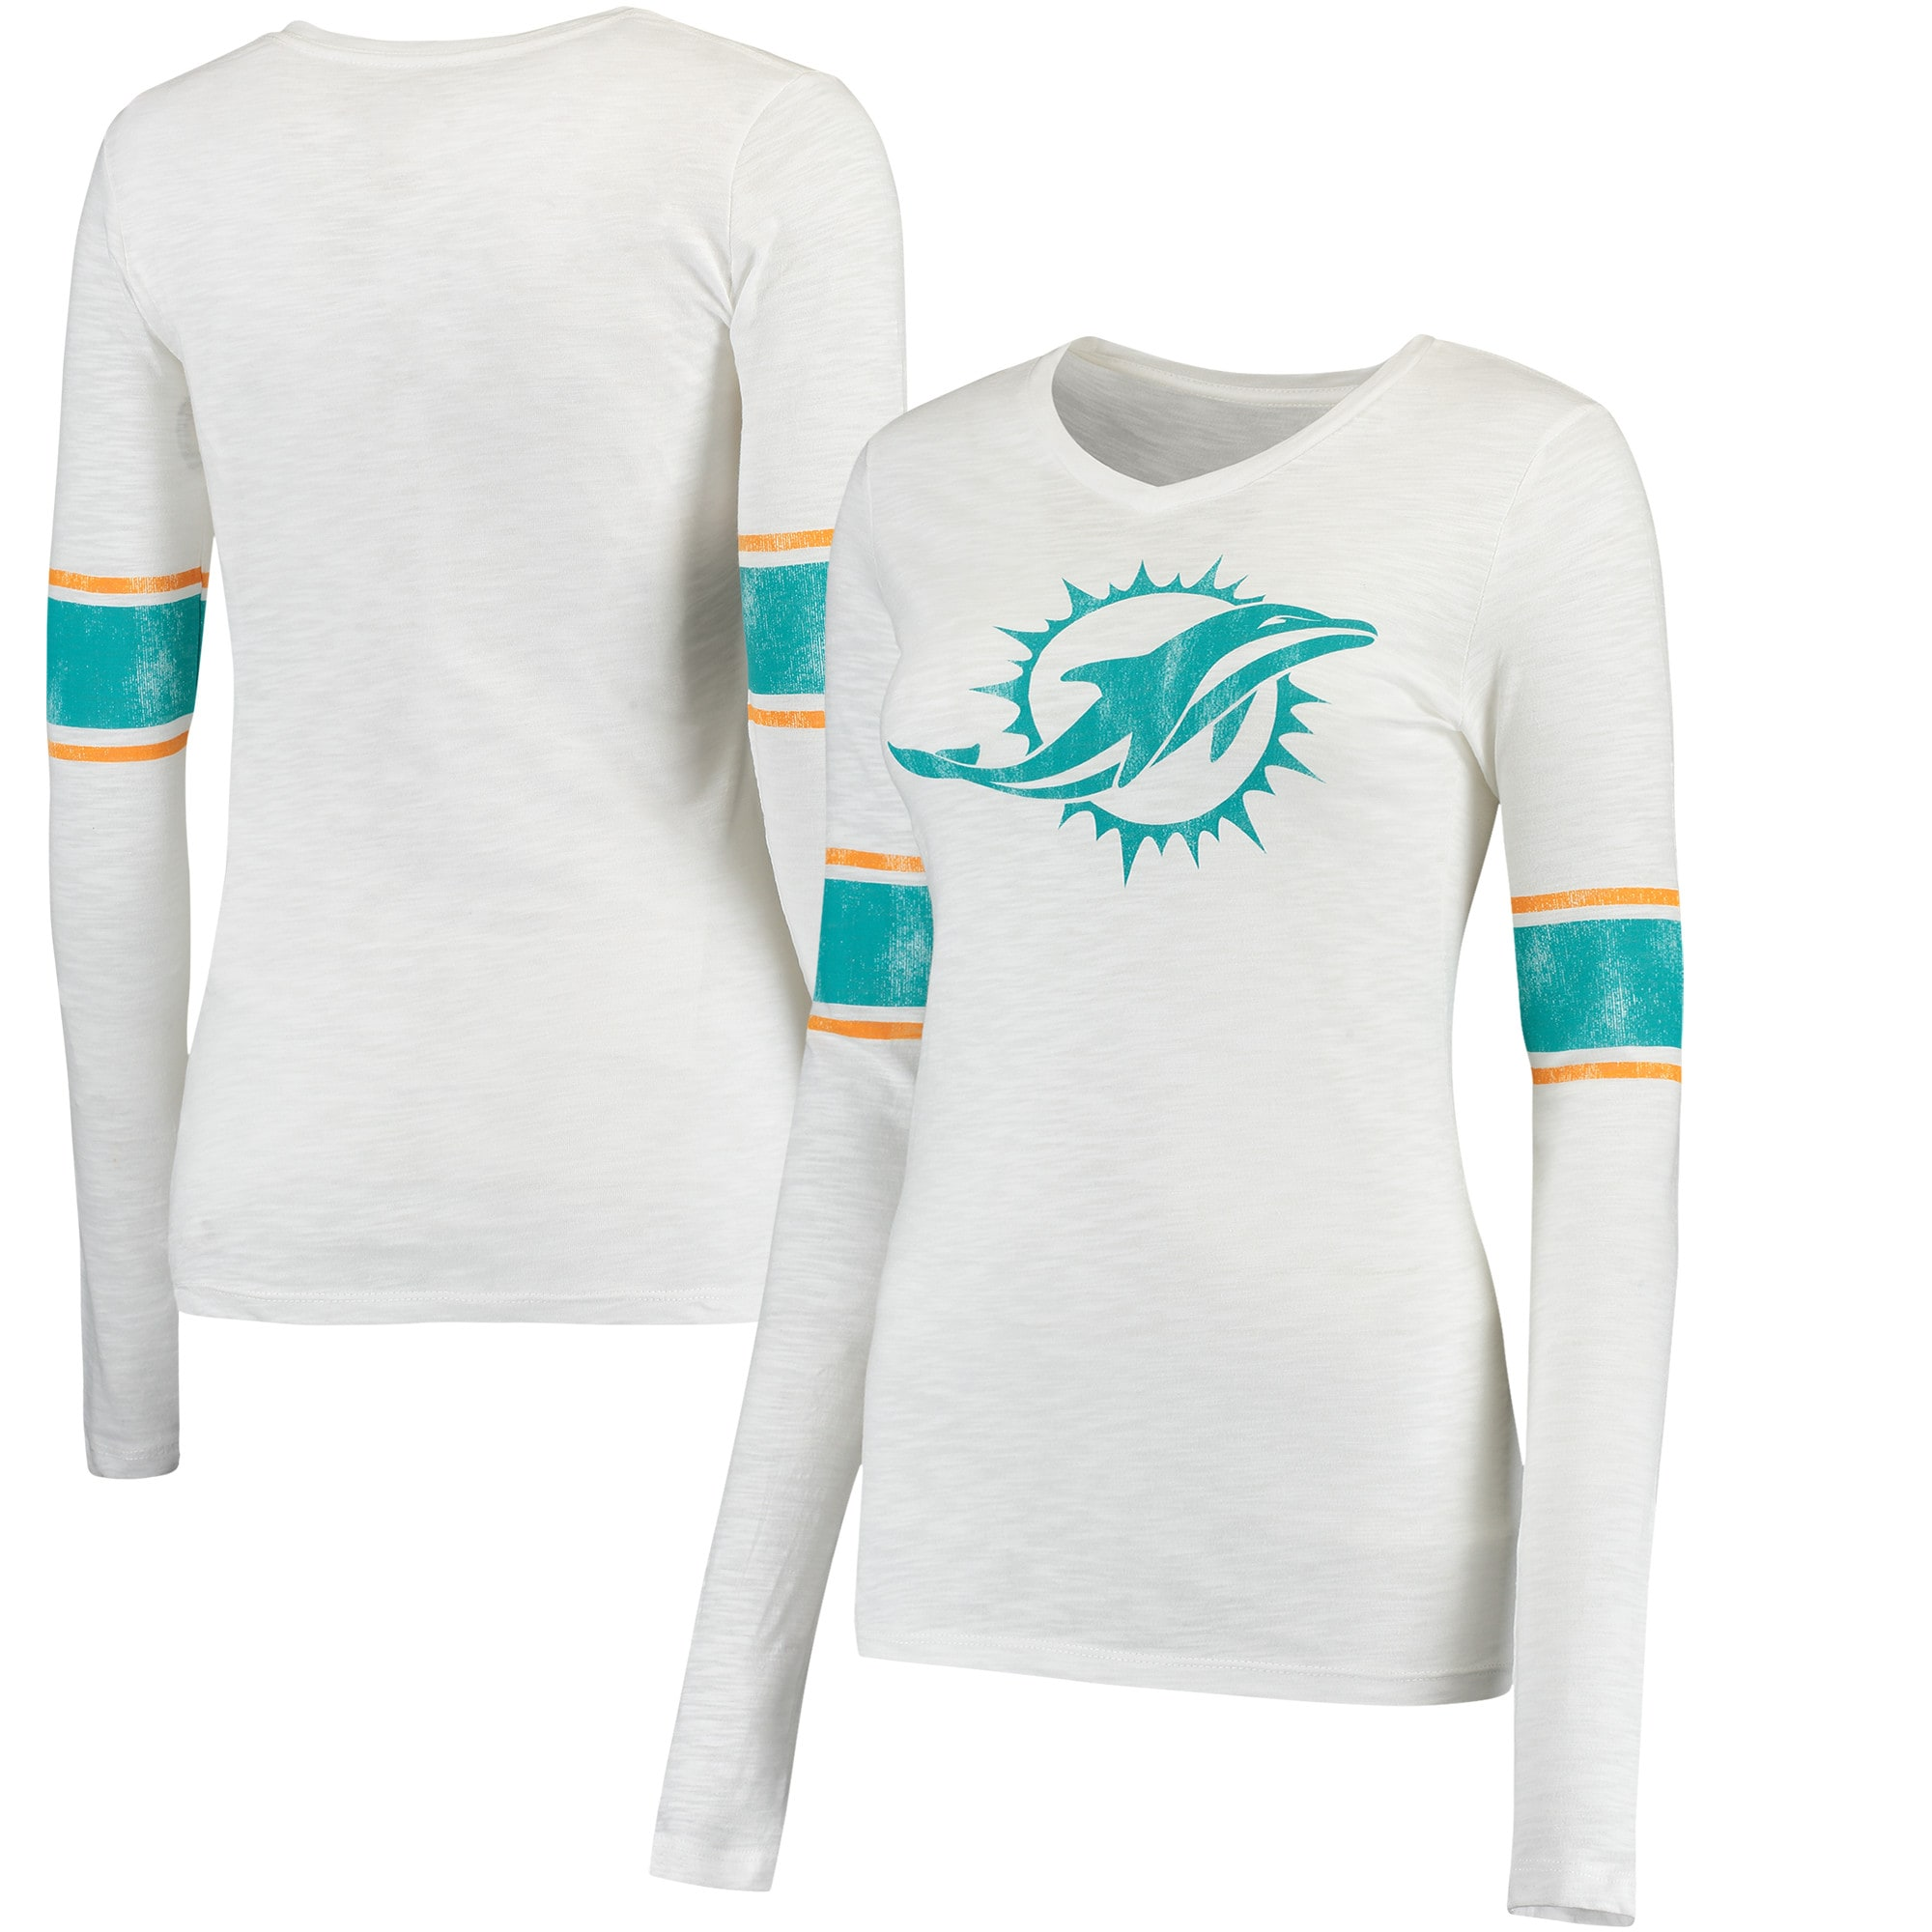 Miami Dolphins Juniors Team Leader V-Neck Long Sleeve T-Shirt - White